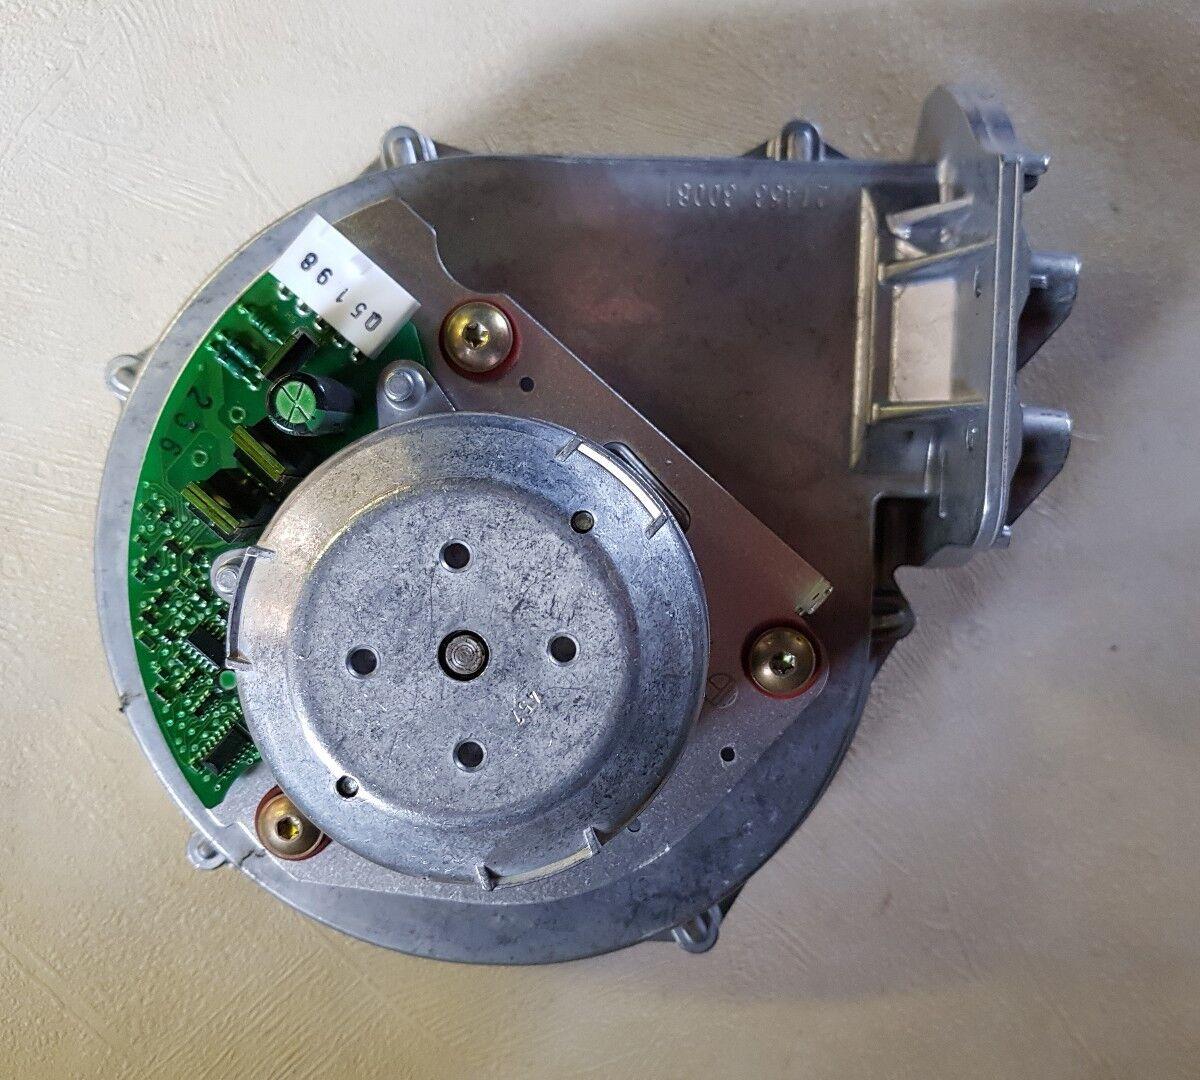 Vaillant la Ecomax, VUW 824E 828E Conjunto de ventiladores 190235 190235 190235 12 meses de garantía 4453ee